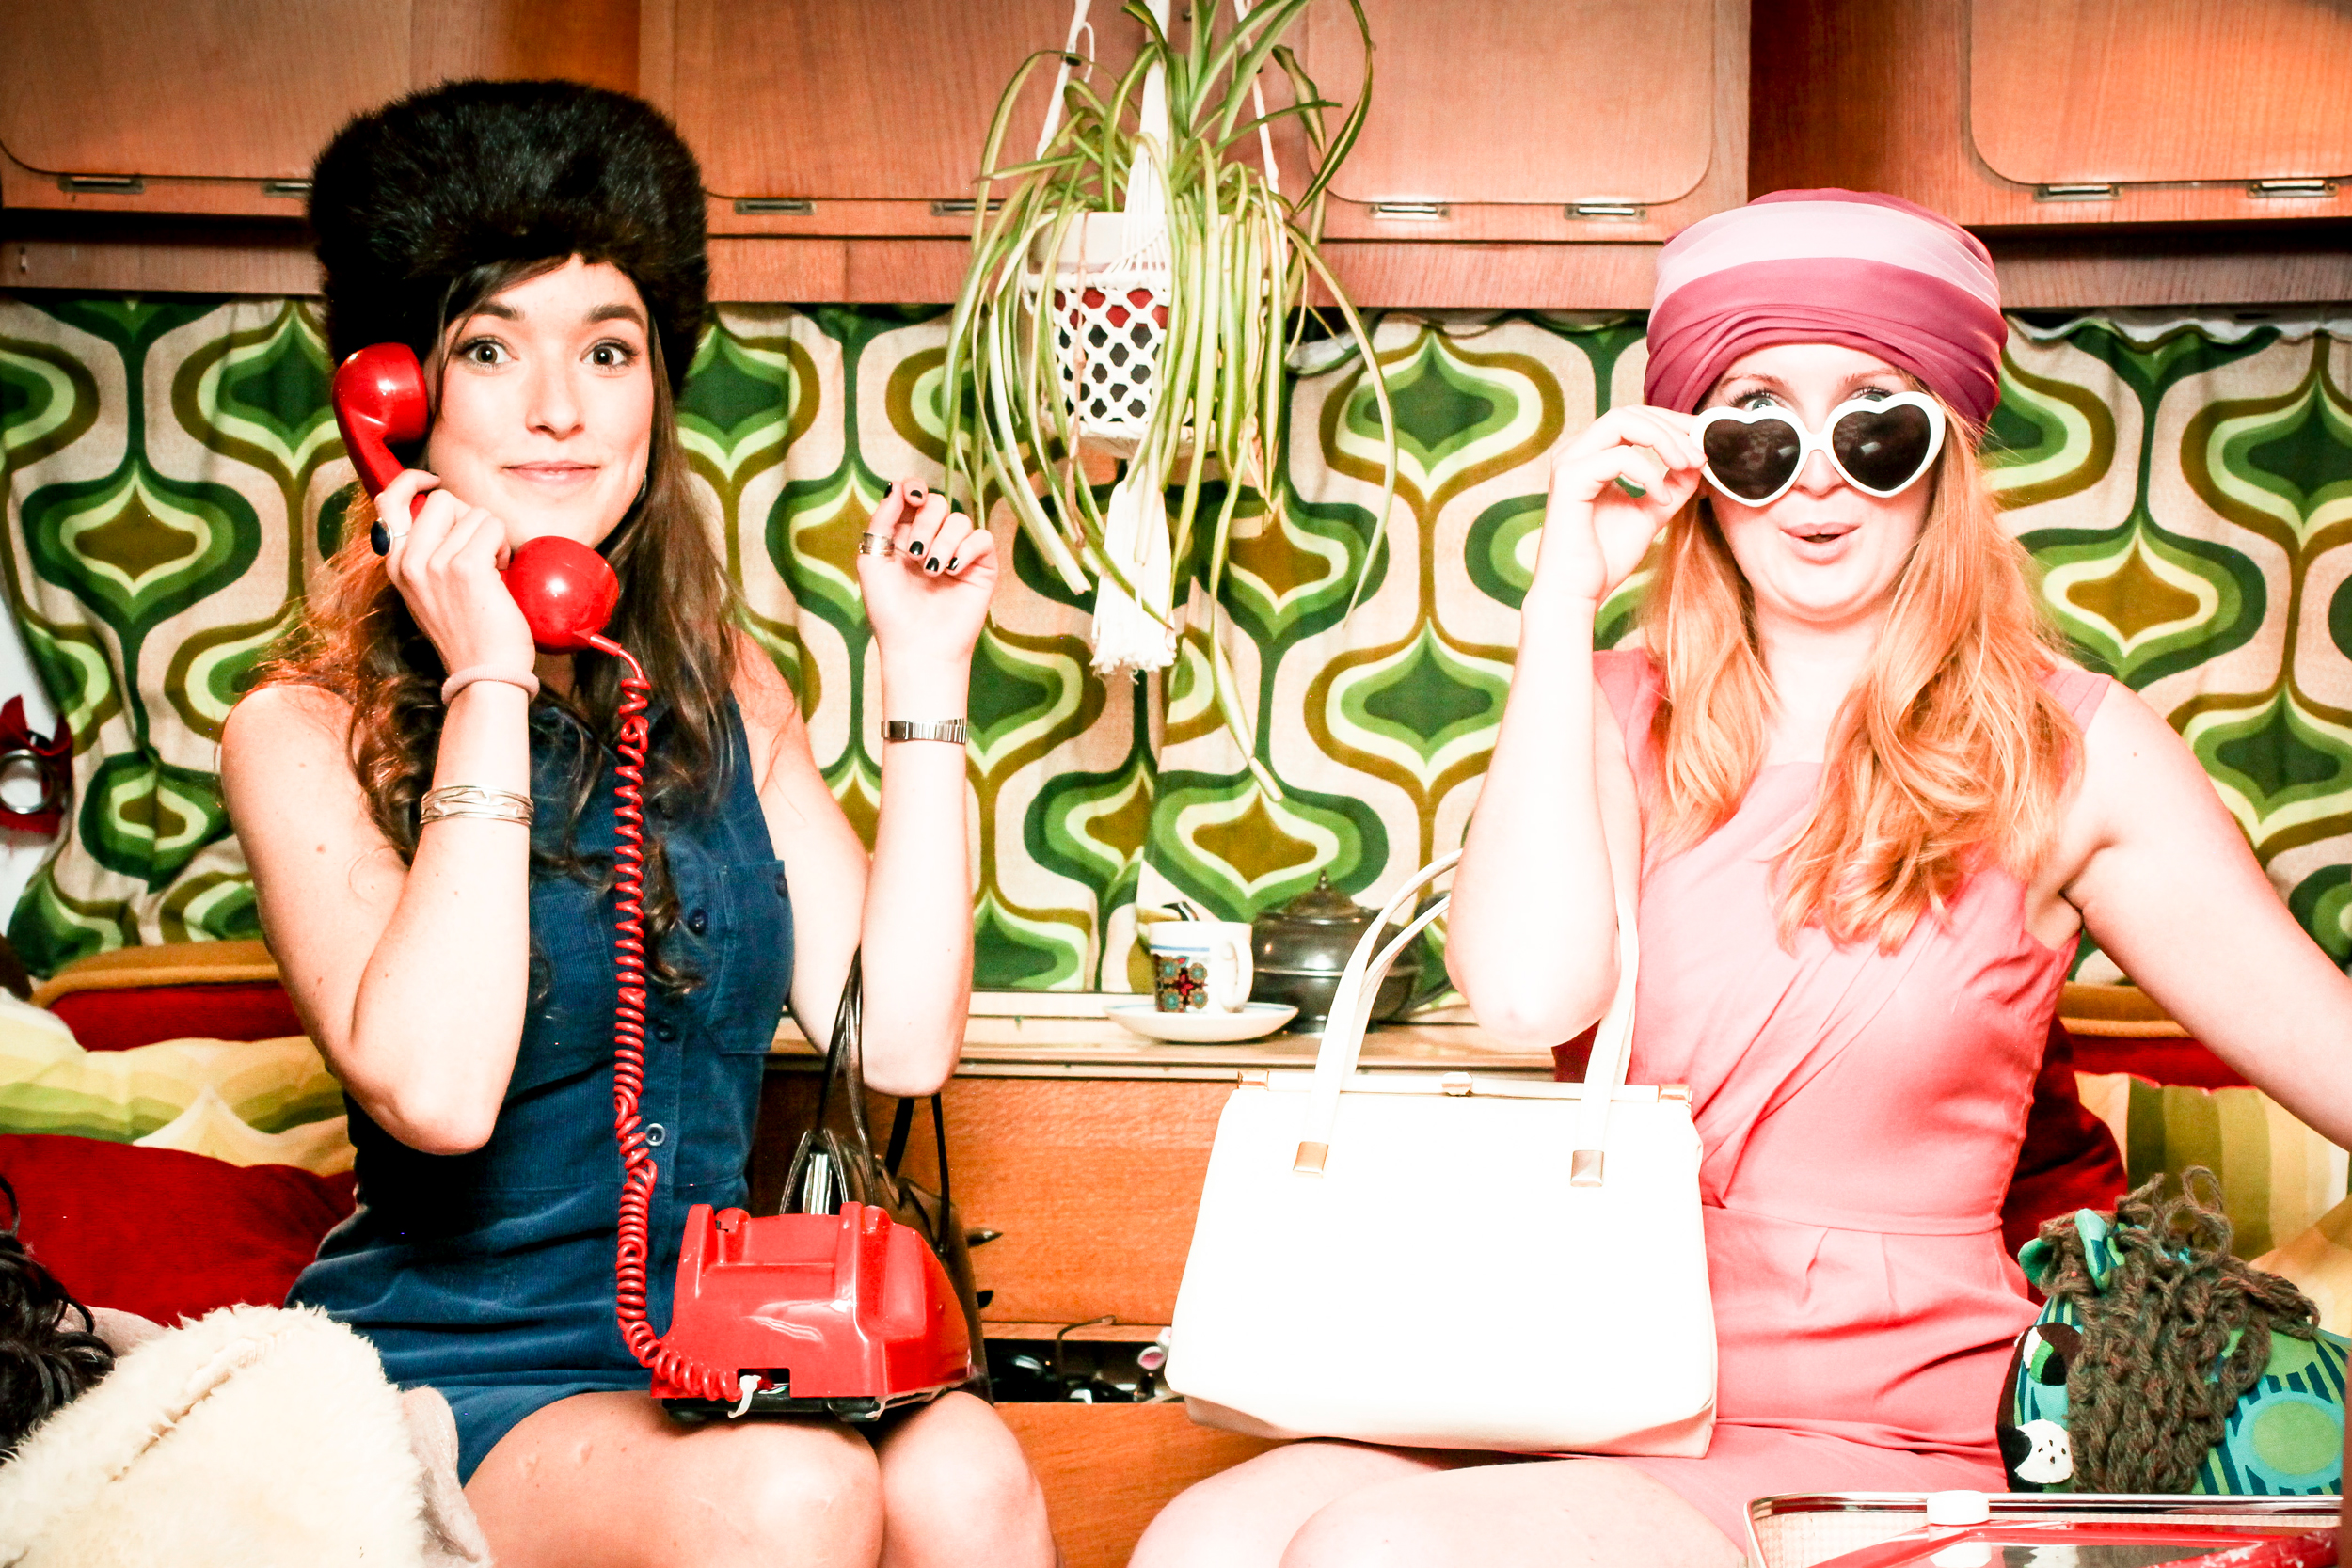 Gladys-&-the-Bubblettes-Photo-Booth-Scotland-8.jpg